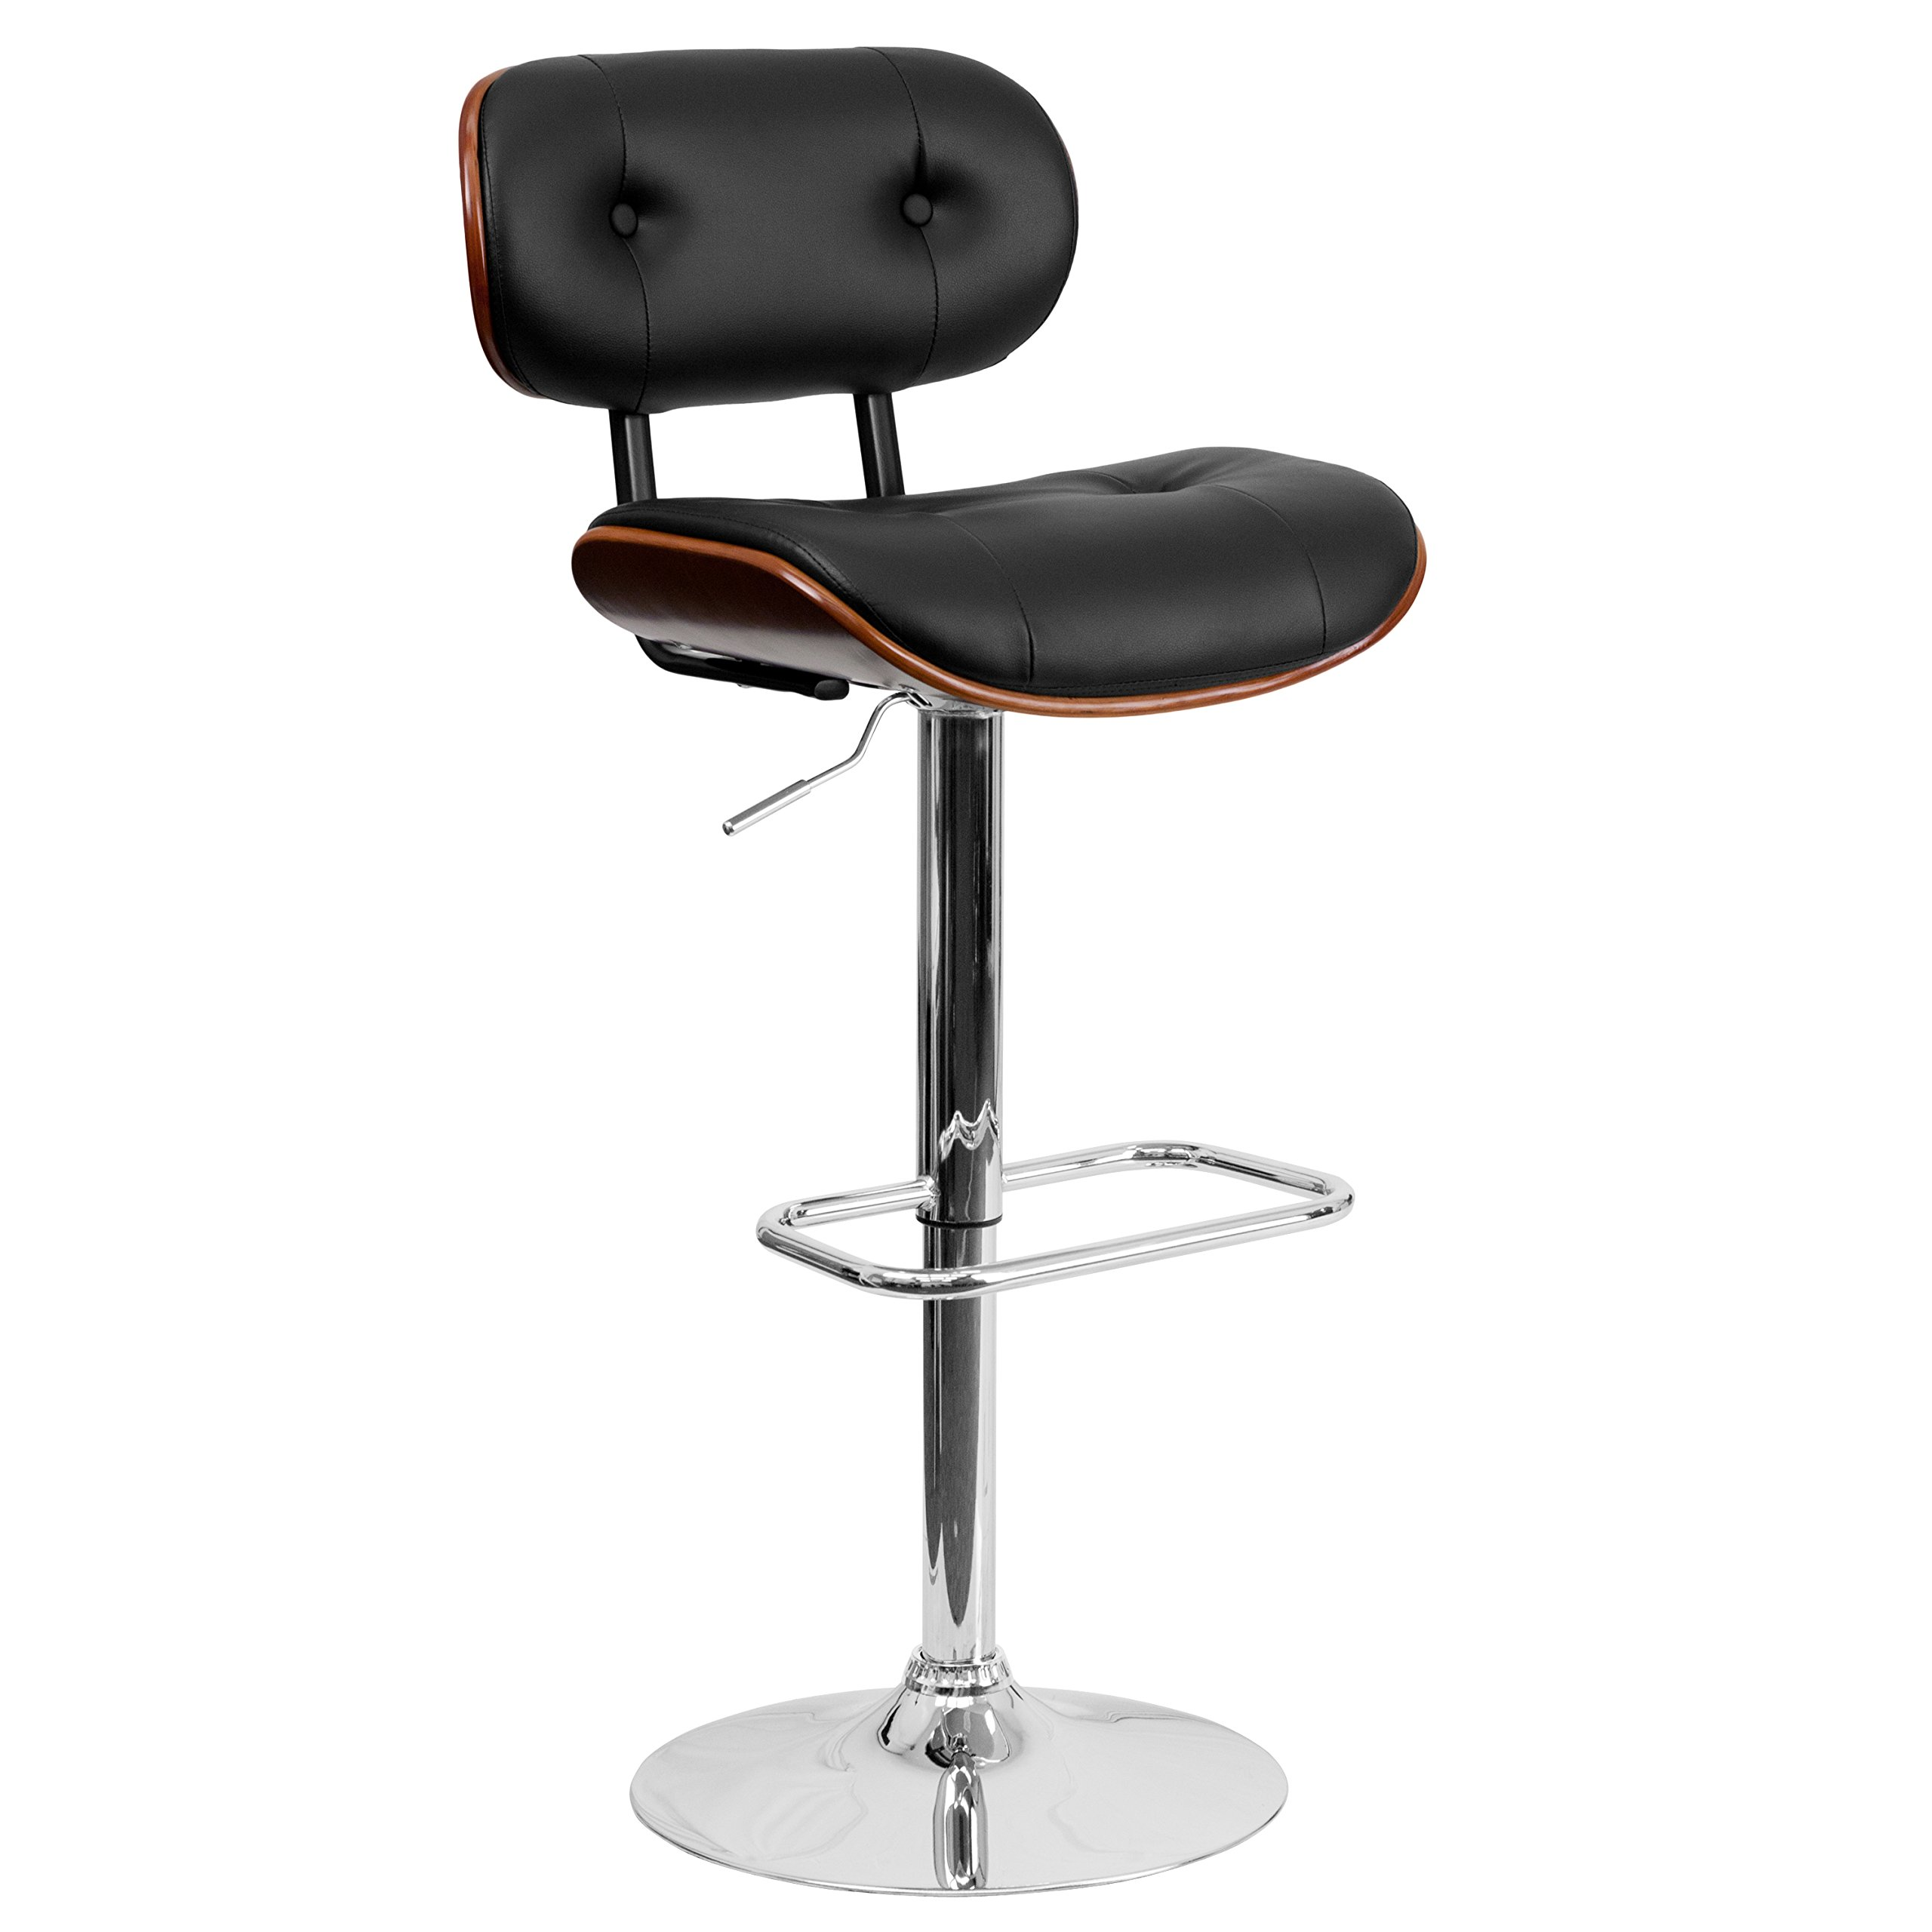 Flash Furniture Walnut Bentwood Adjustable Height Barstool With Button Tufted Black Vinyl Seat Furniture Decor